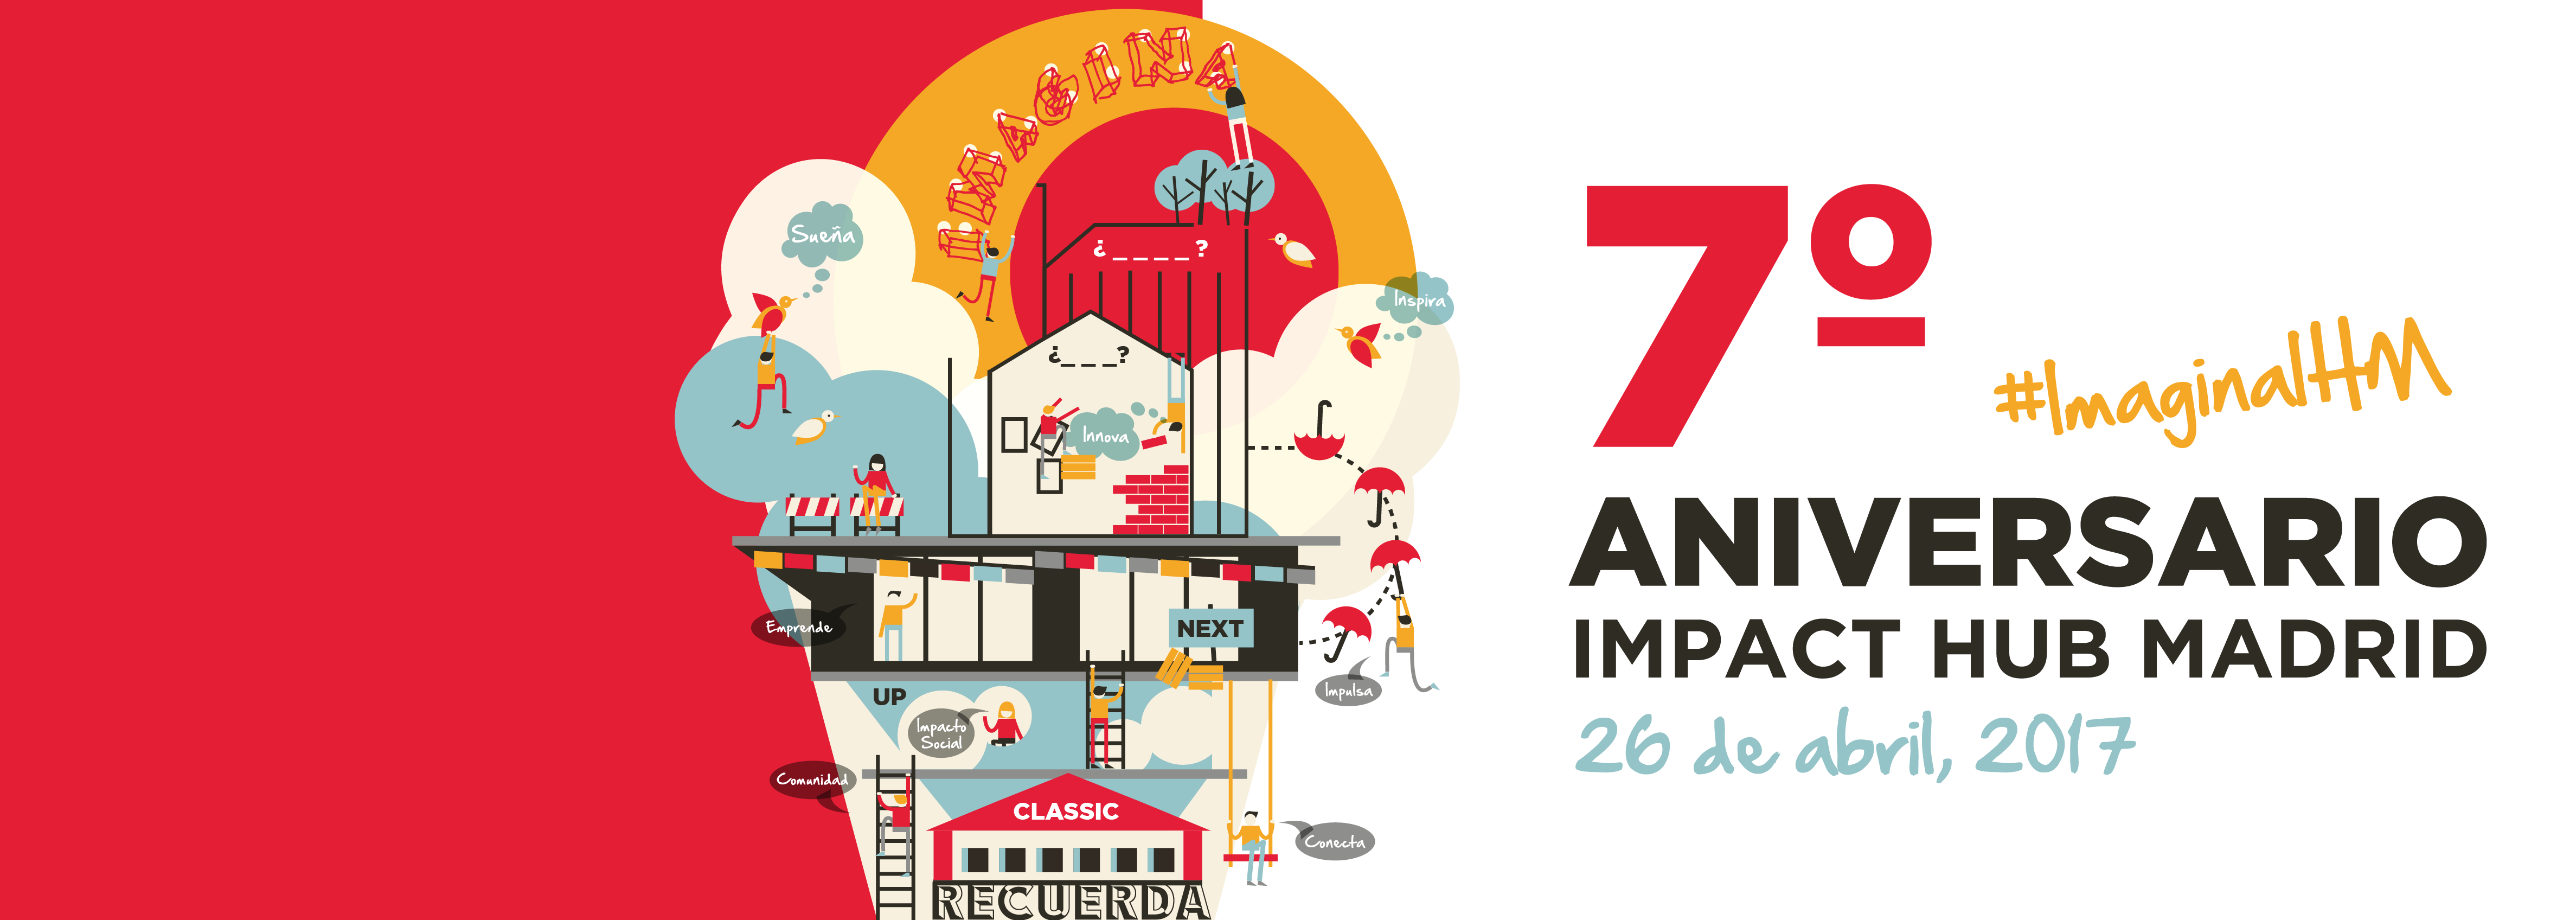 Recuerda. Imagina. 7º aniversario Impact Hub Madrid